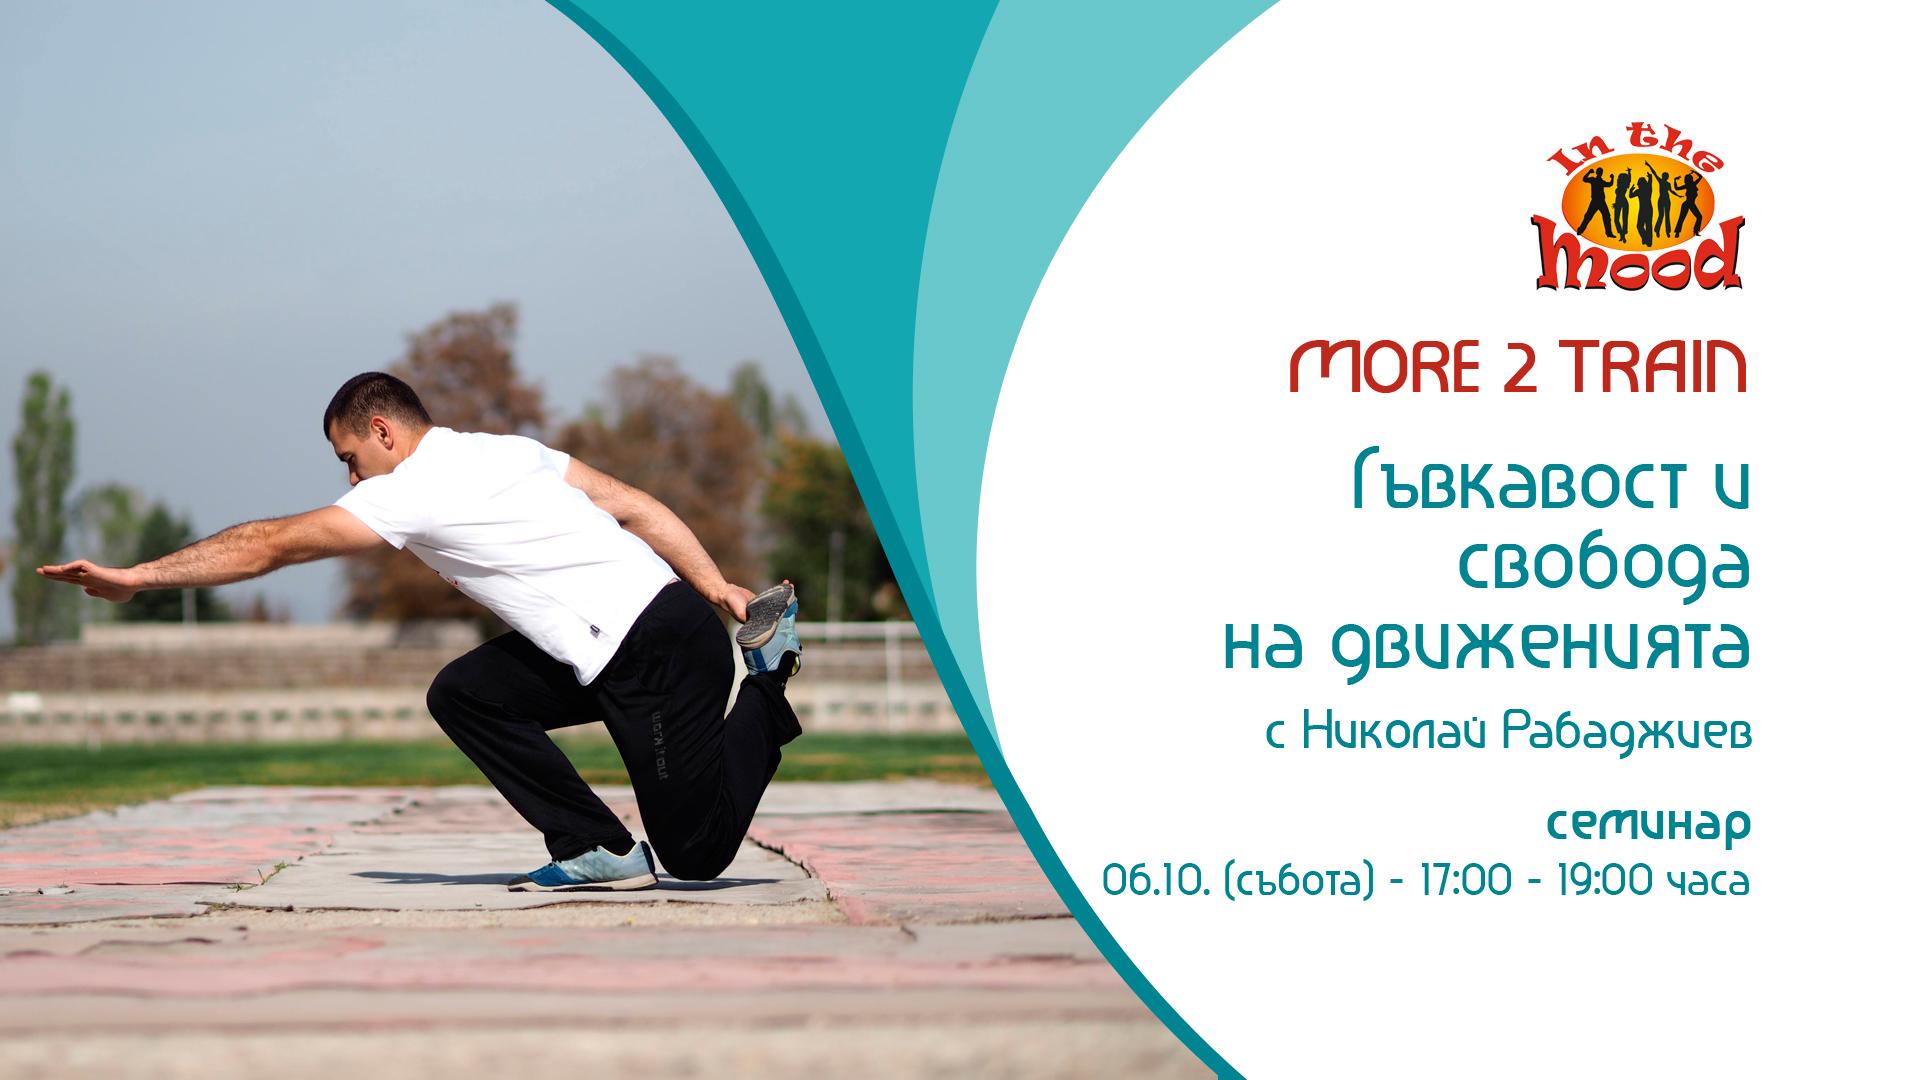 Freedom of movement seminar